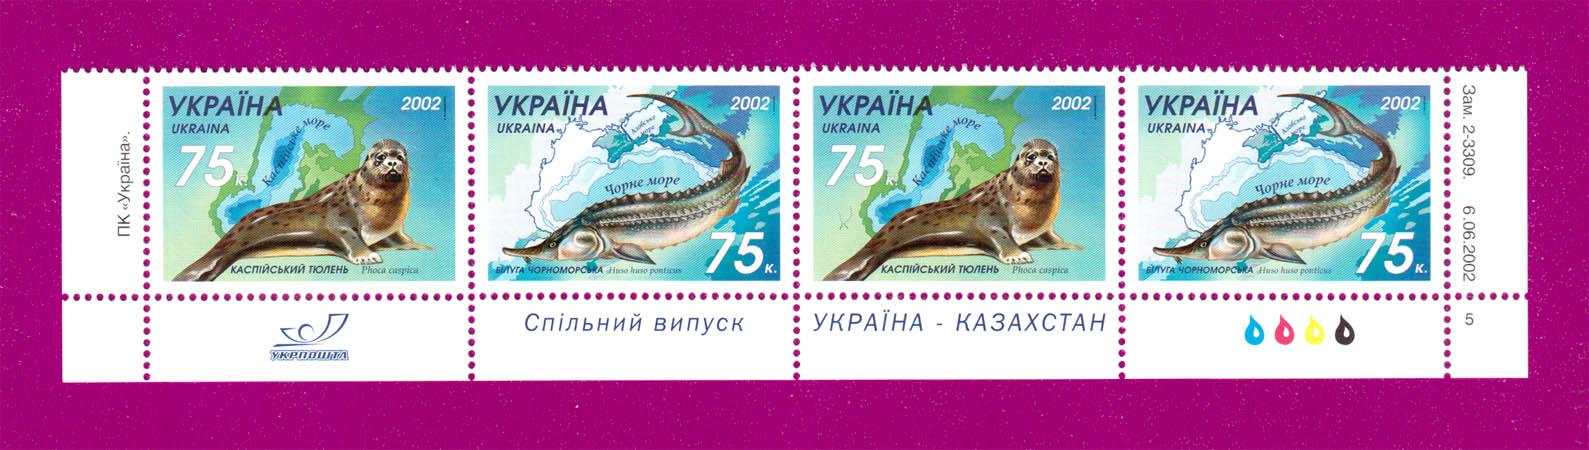 2002 часть листа Фауна Тюлень-белуга НИЗ Украина